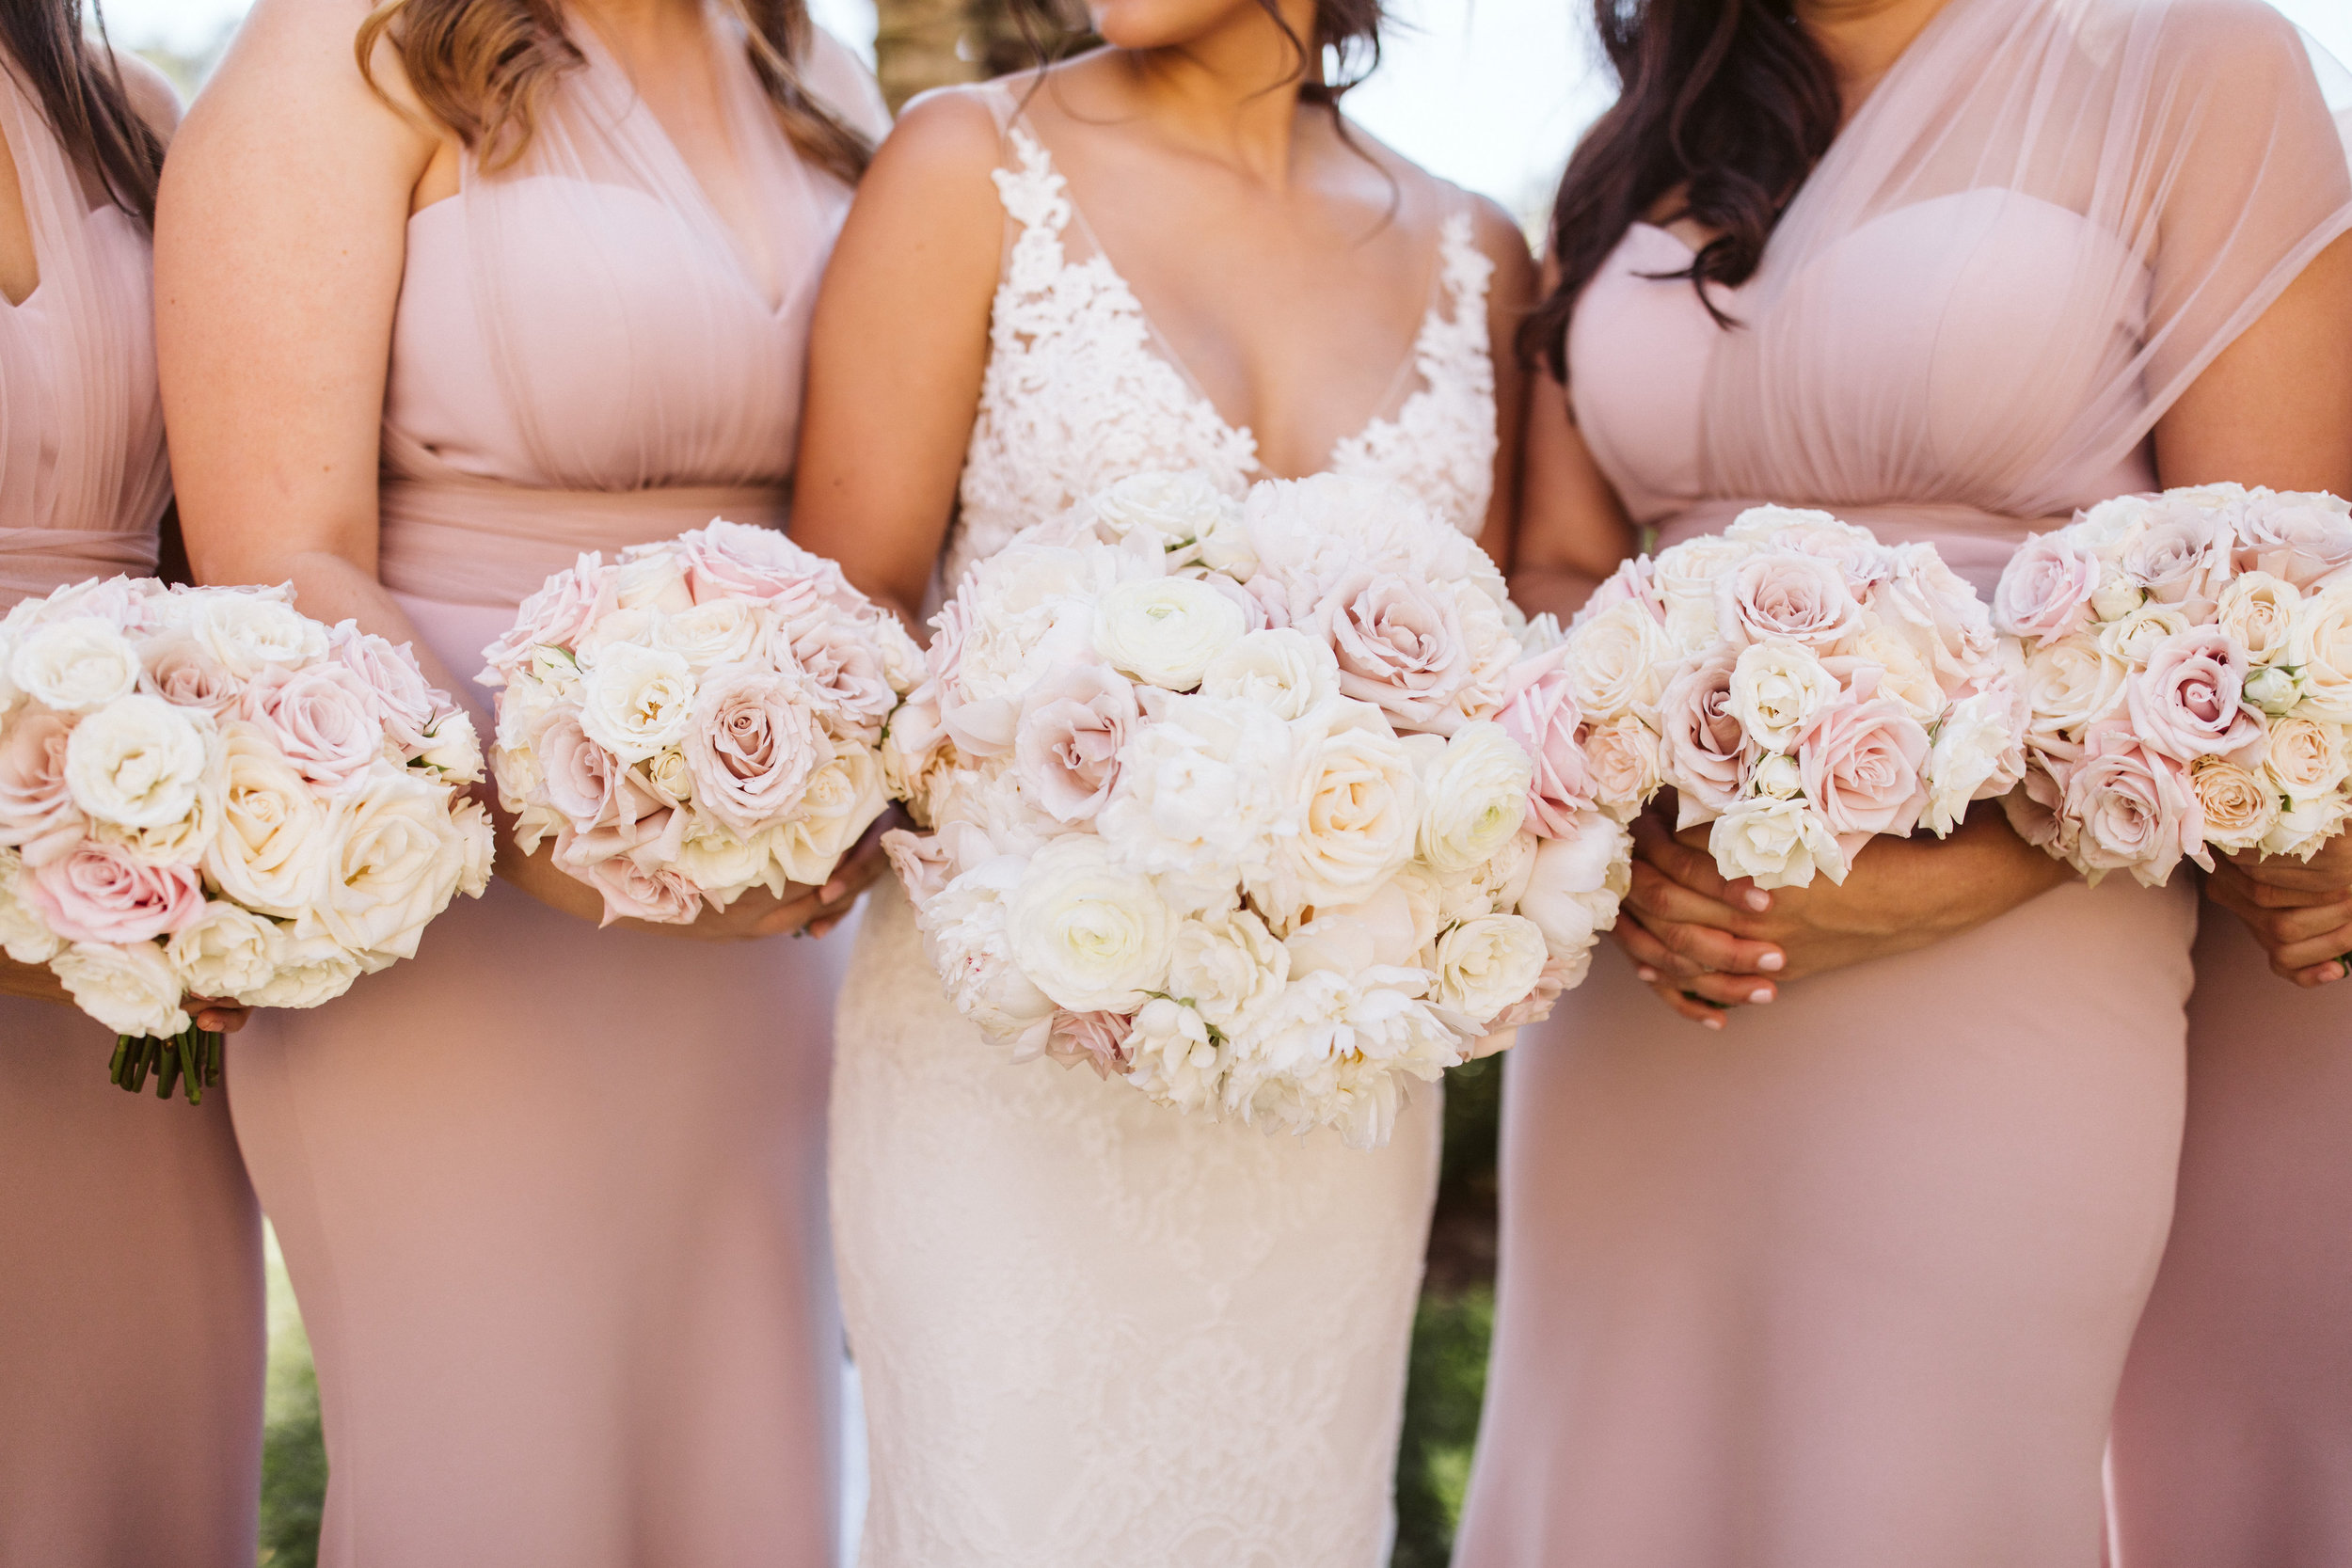 Wedding Photographer:  Nate Puhr  | Wedding Designer:  Whitney Carillon  | Wedding Location: Four Seasons Resort Orlando